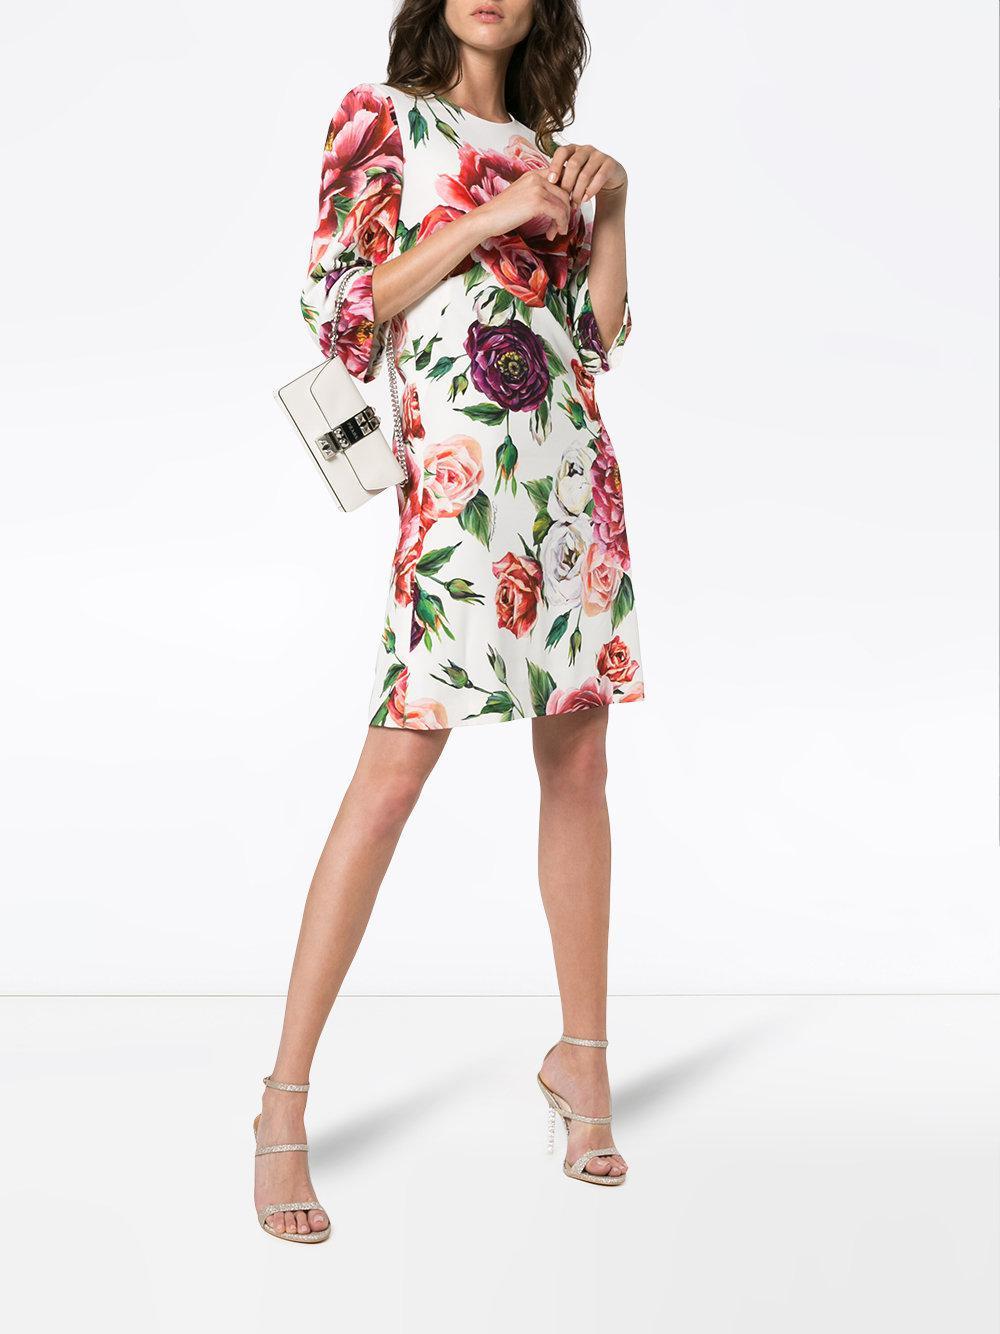 95c3808bca Dolce   Gabbana - Multicolor Printed Cady Dress - Lyst. View fullscreen